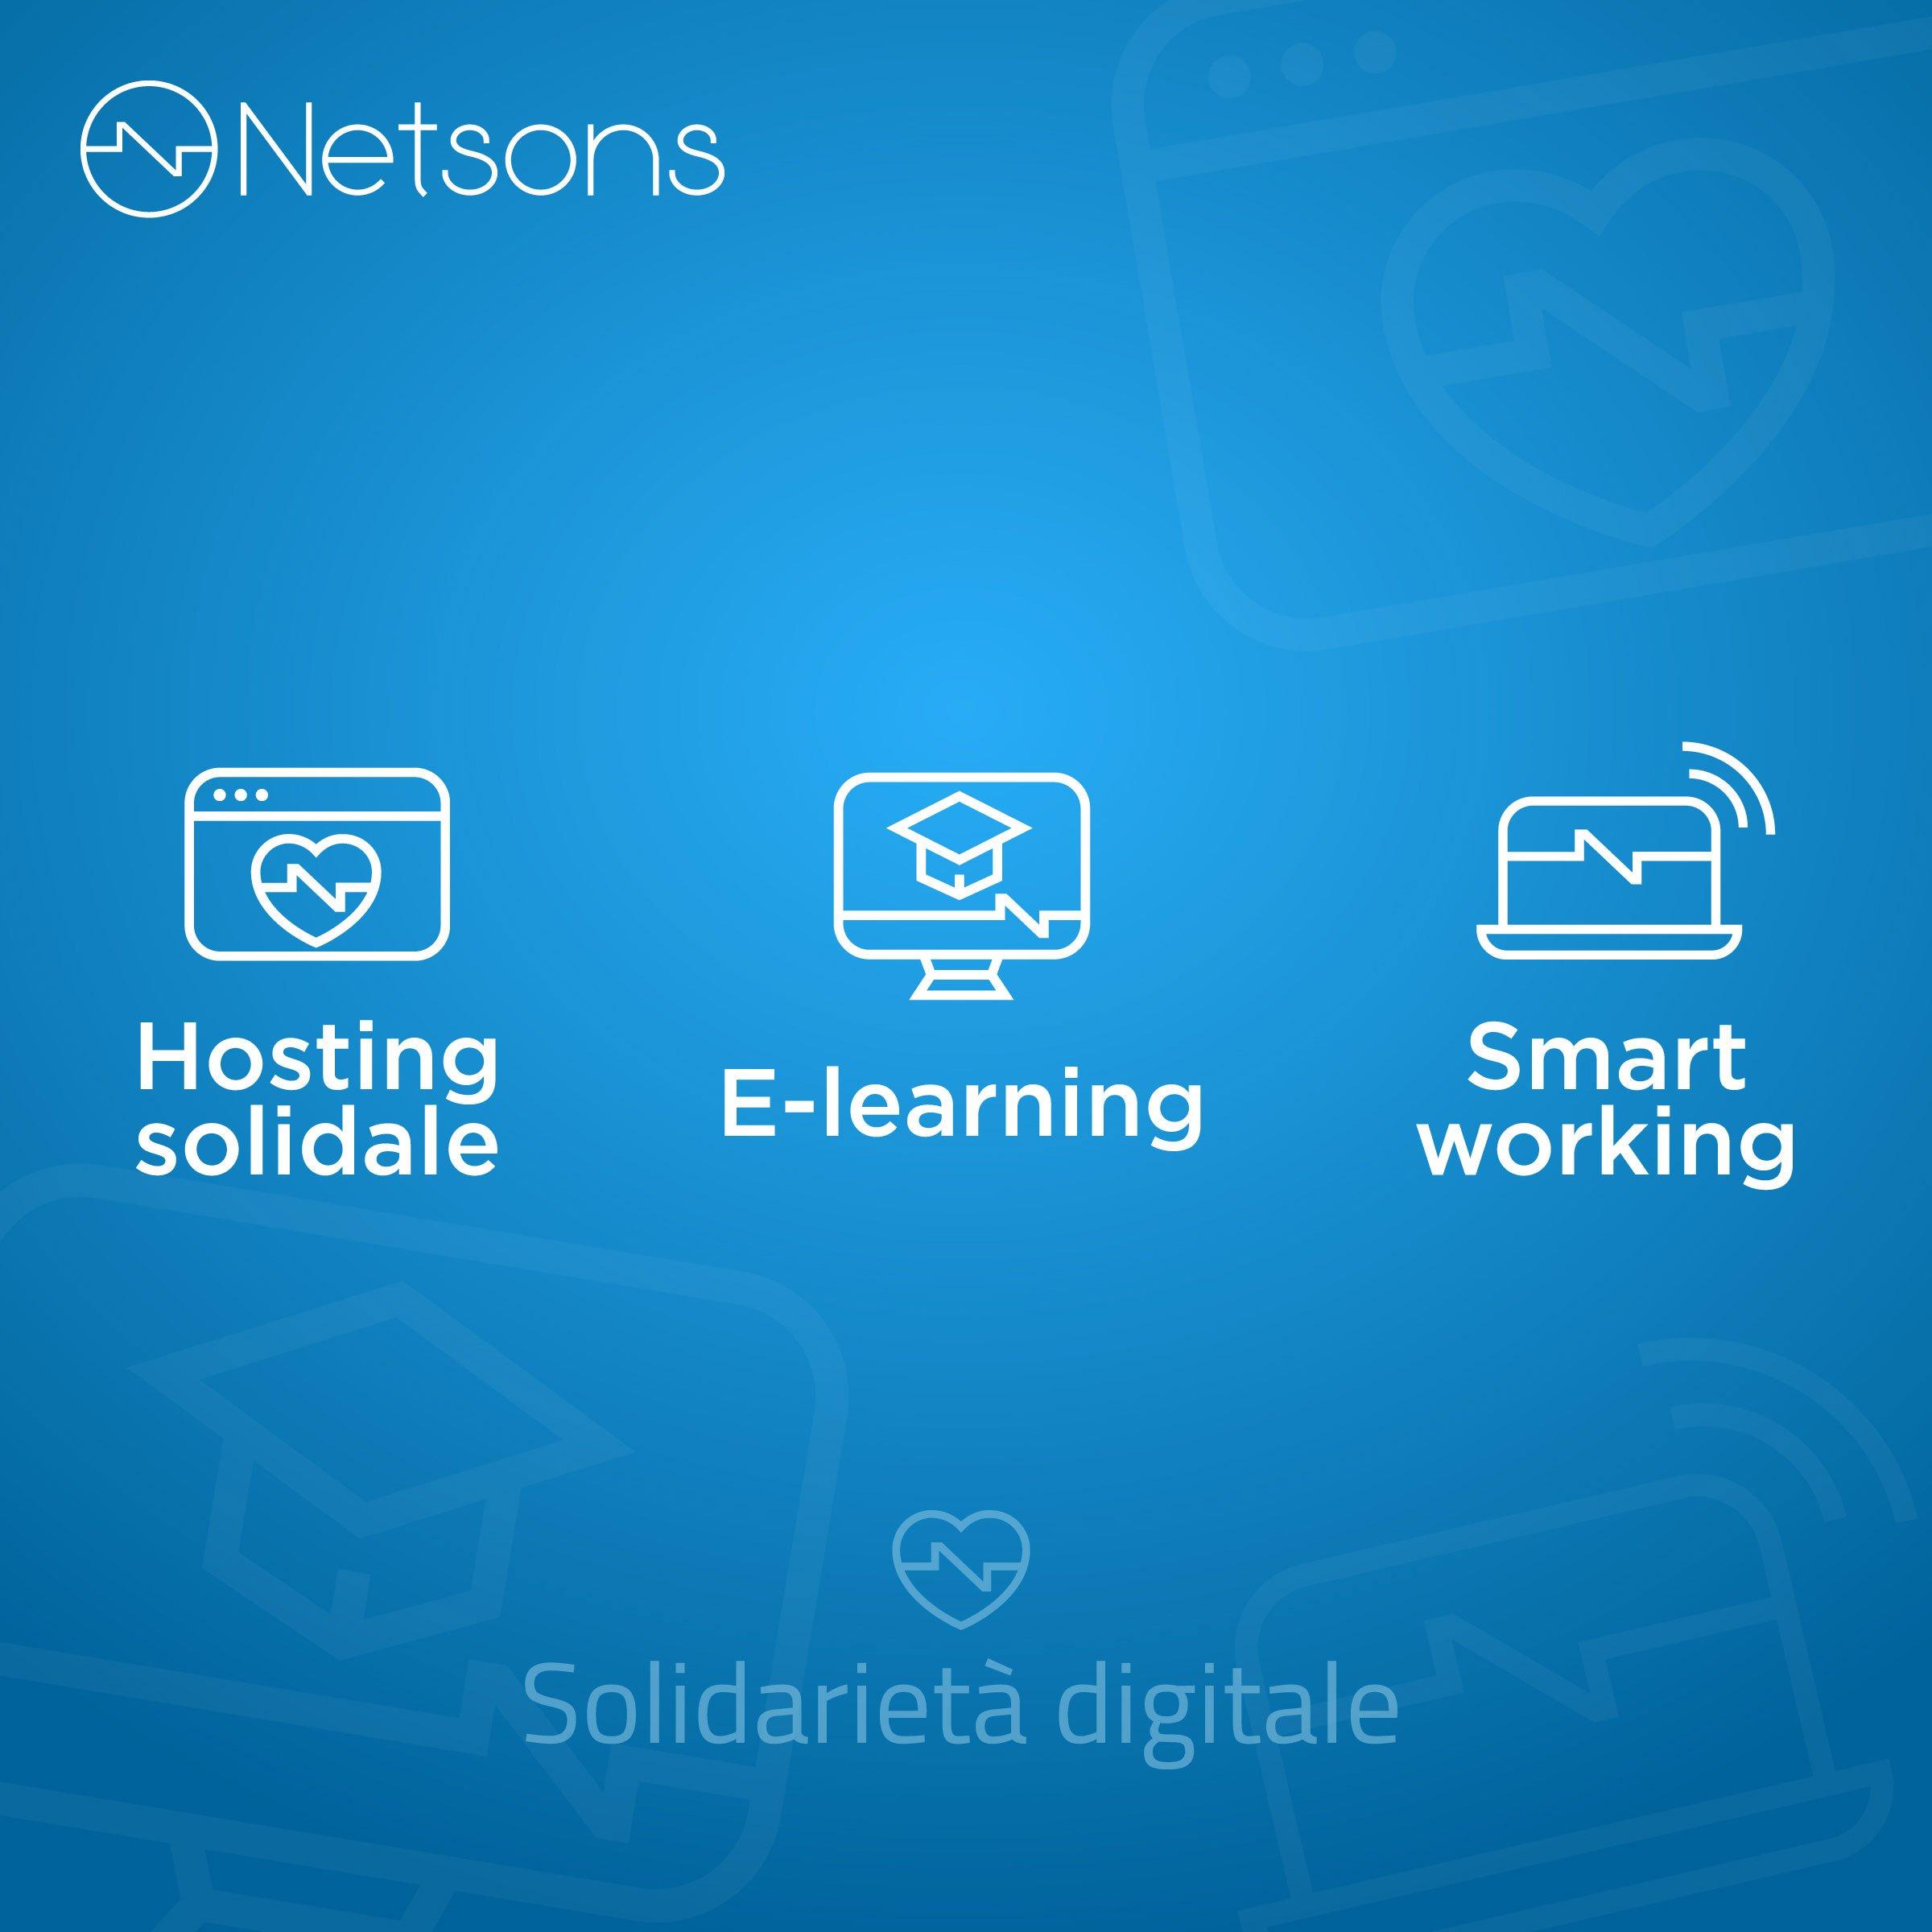 solidarietà digitale netsons soluzioni